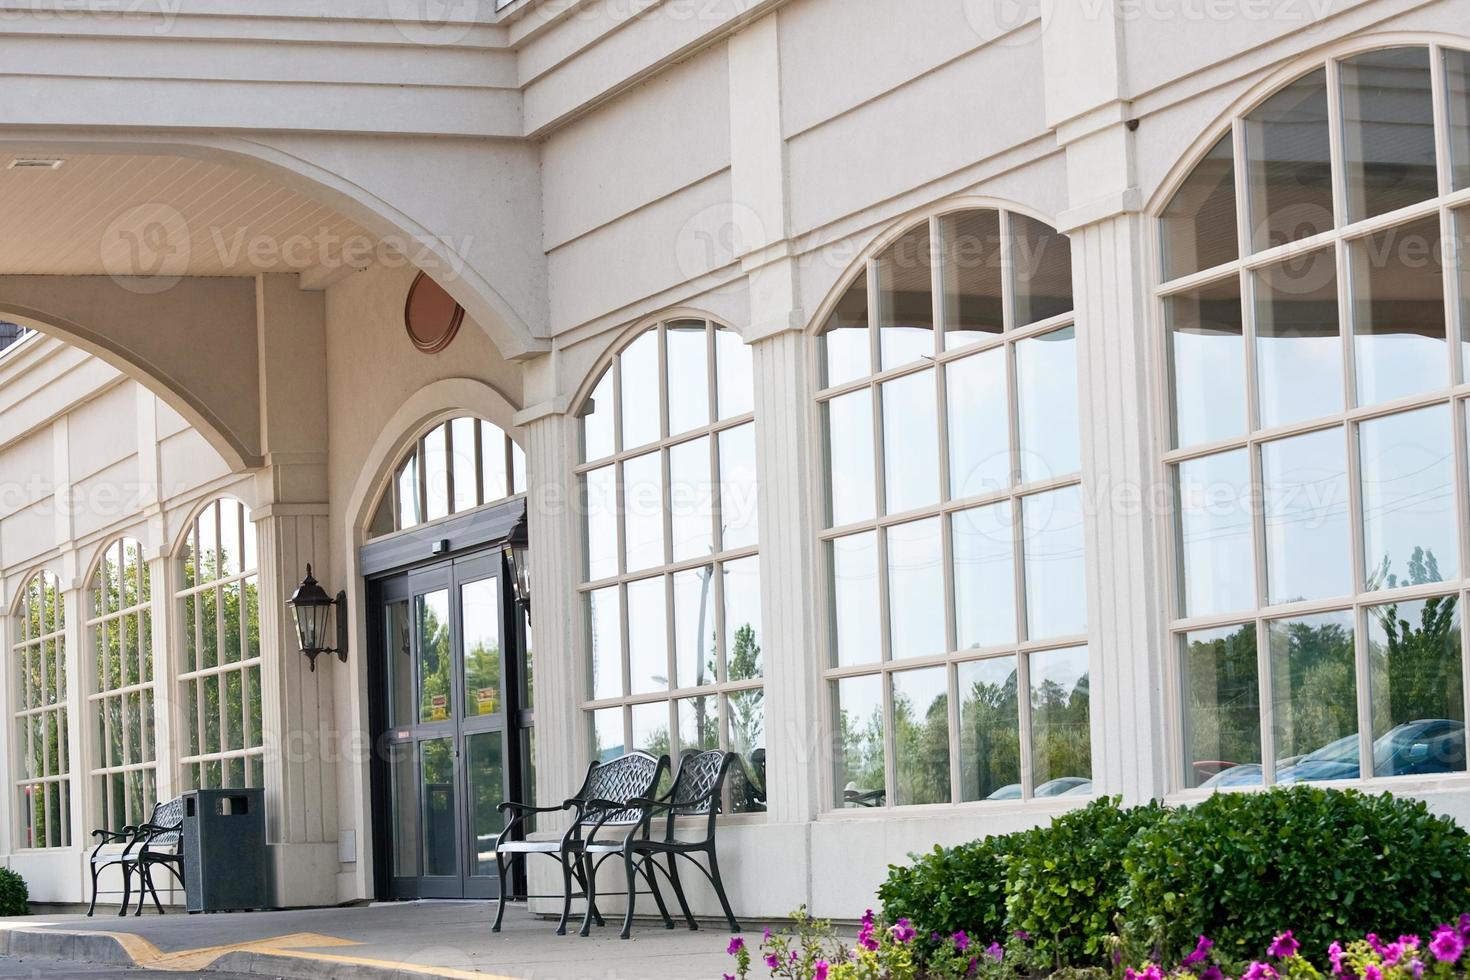 Haupteingang des Hotels foto